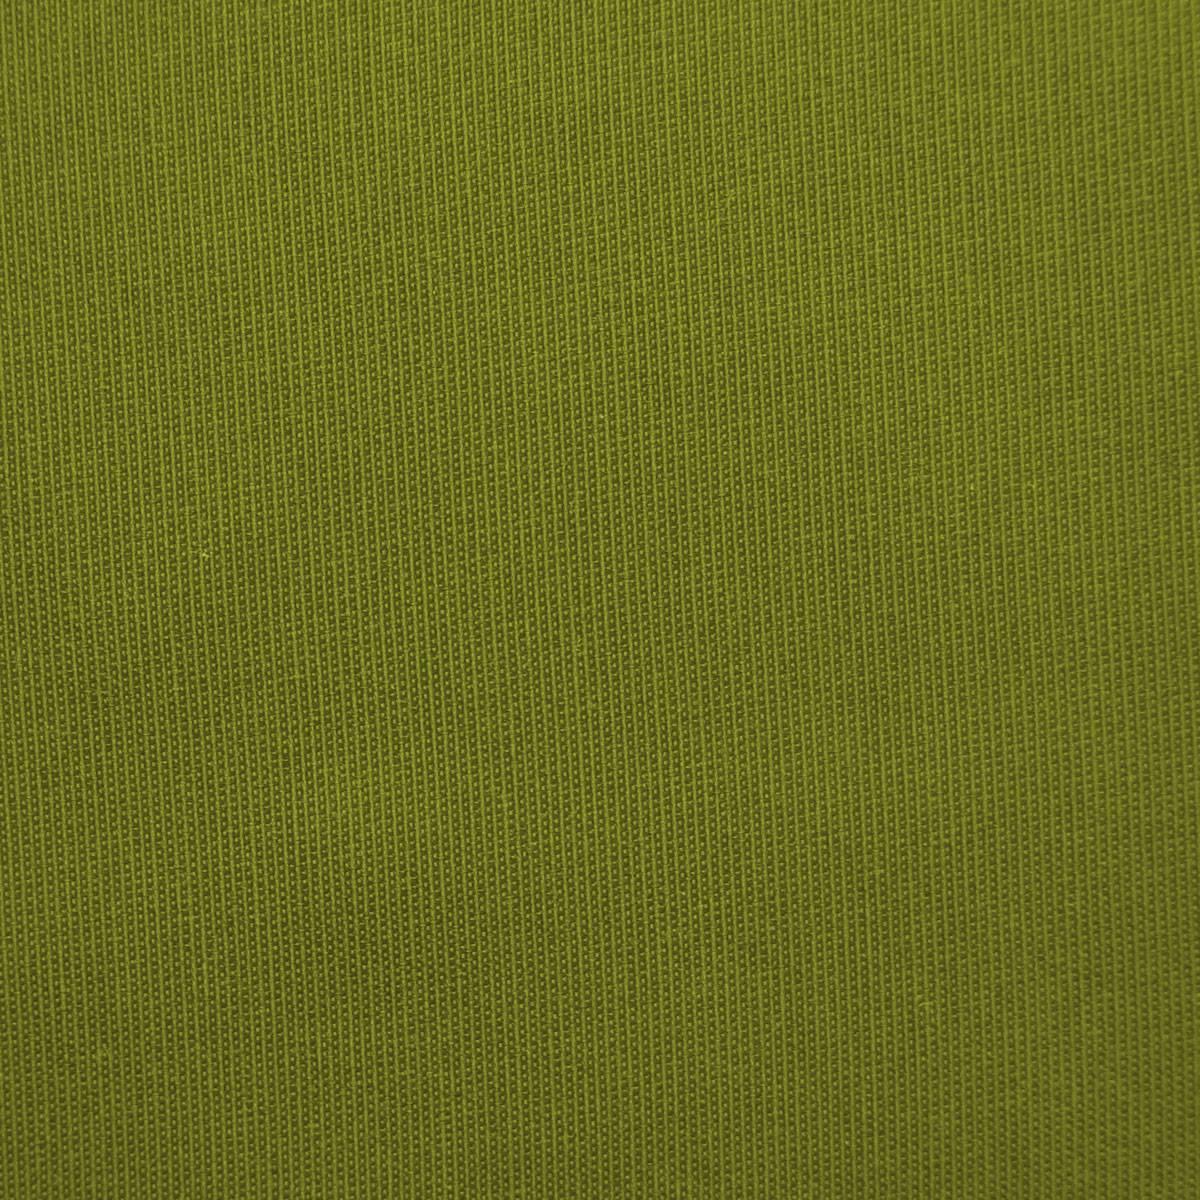 10x10cm vorhangdetail blickdichter vorhang olivegrün hell, Deko ideen